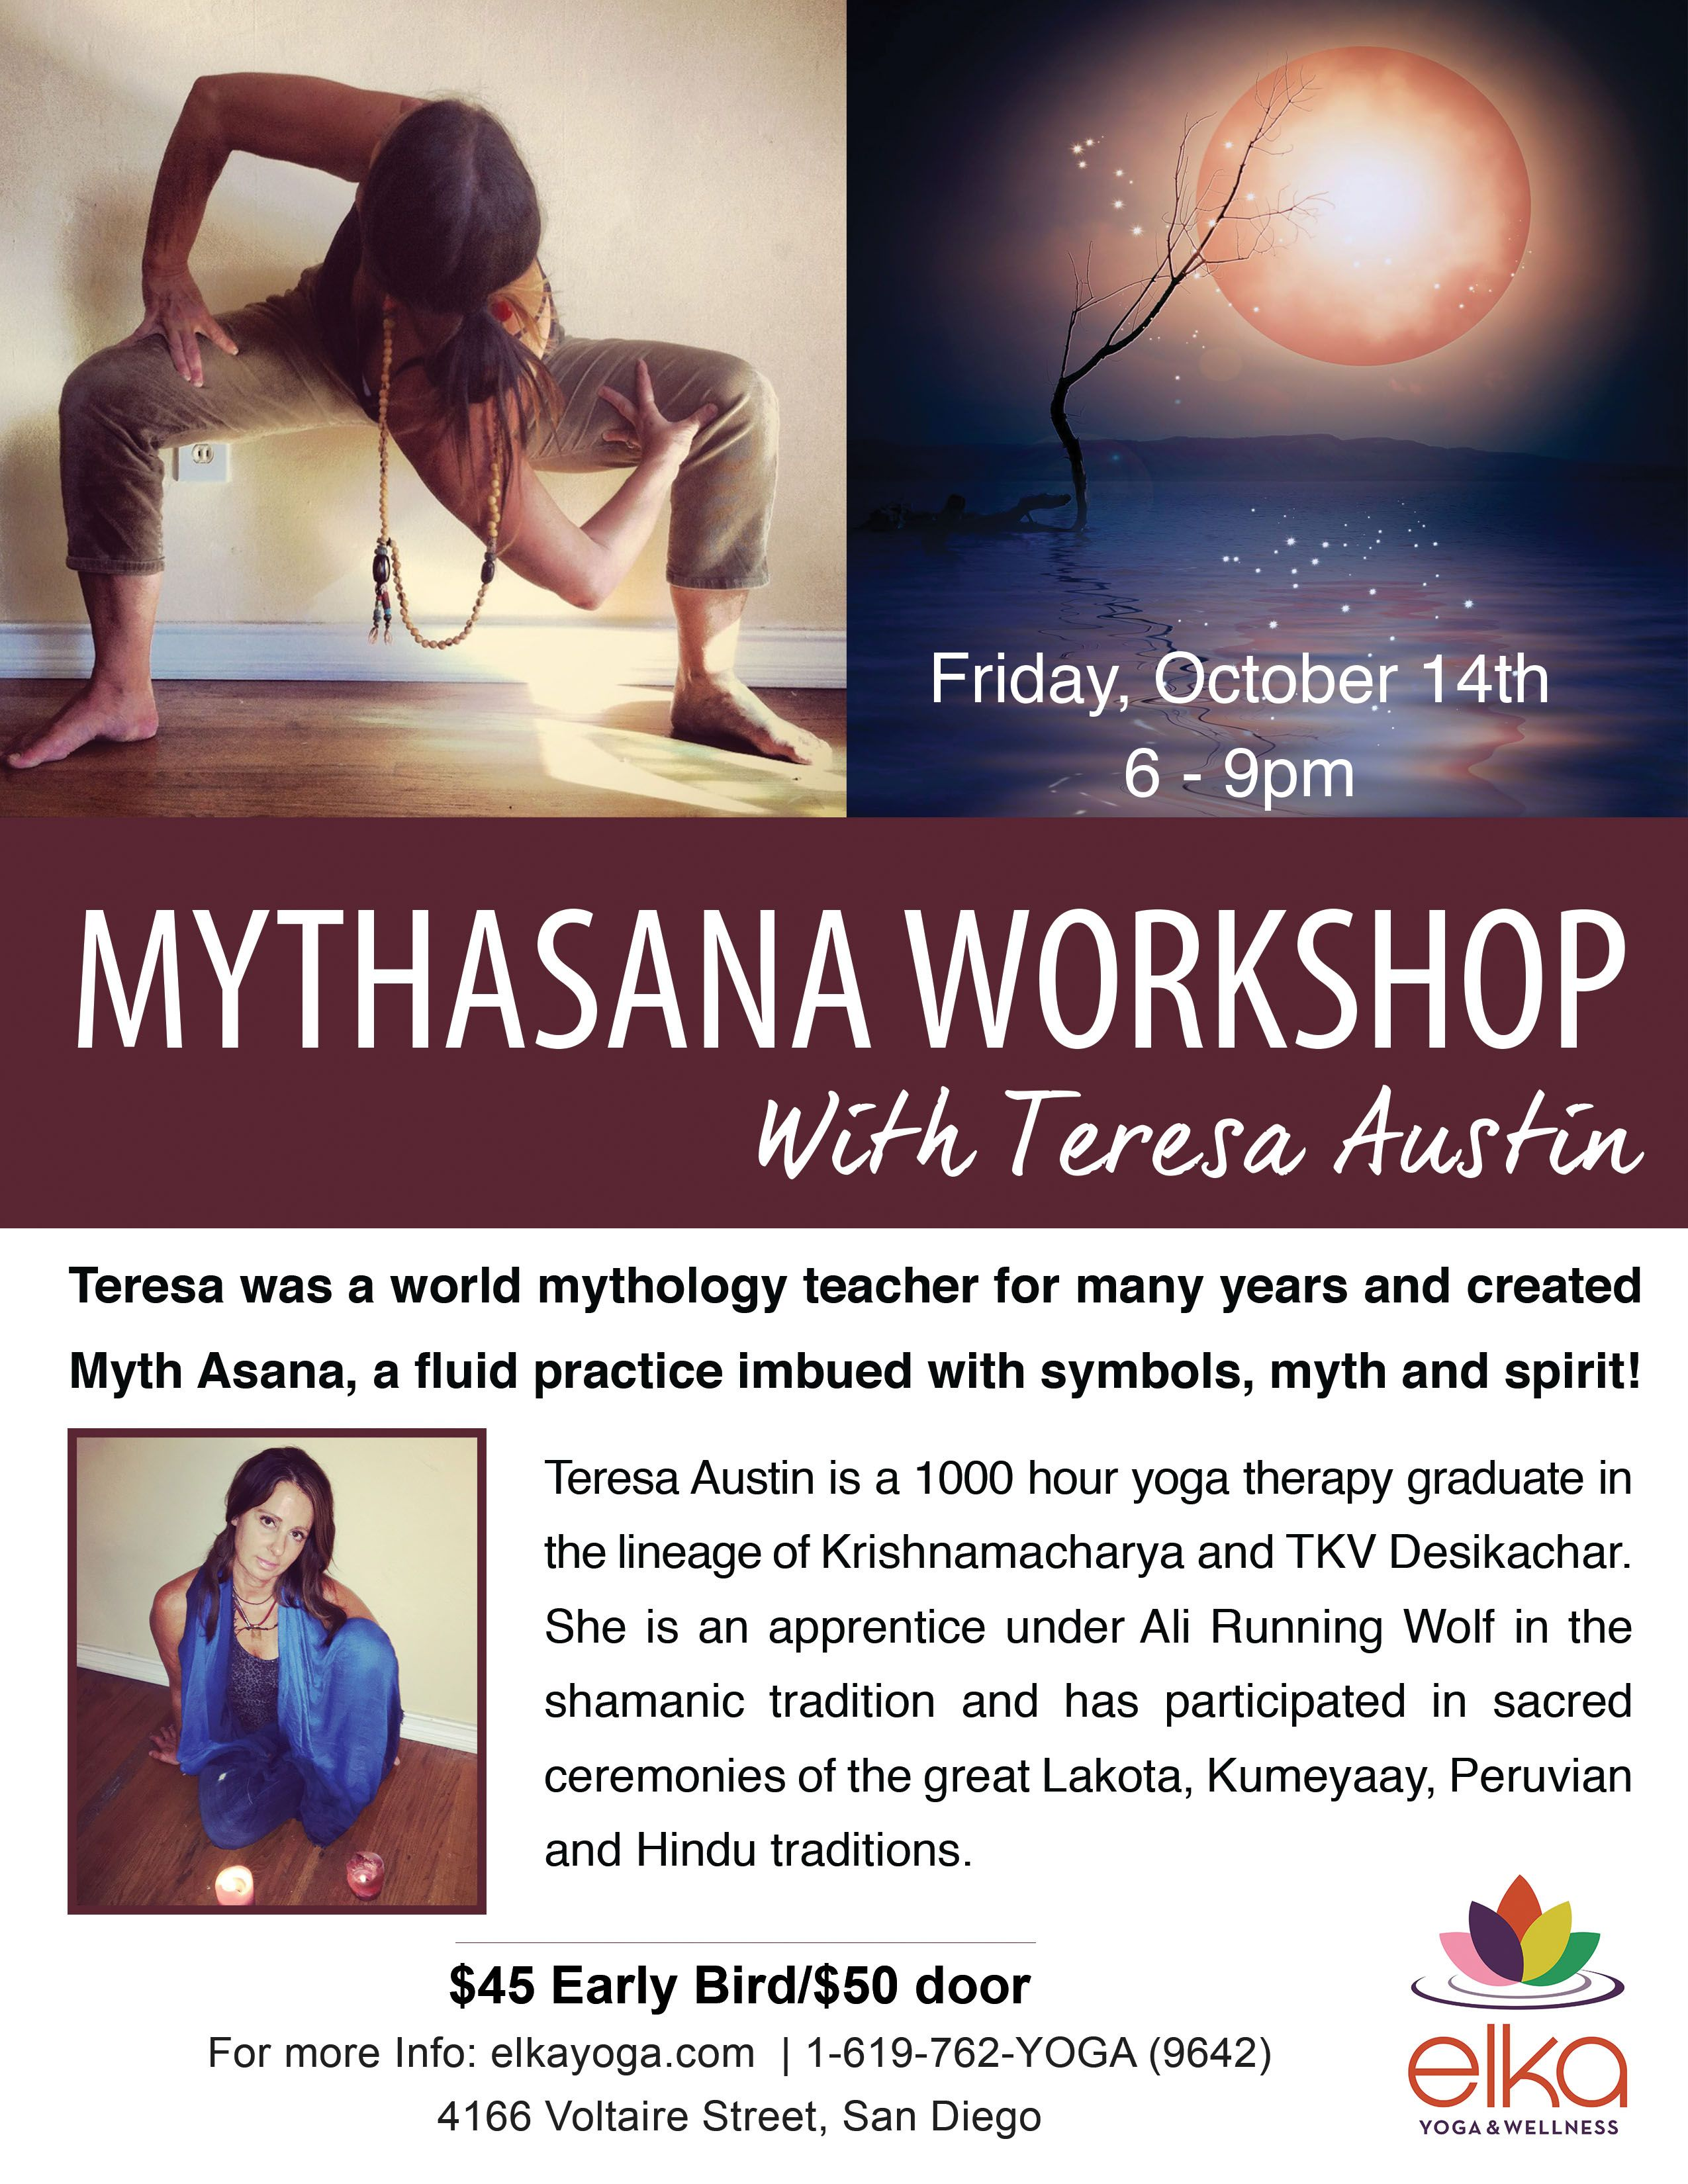 MythAsana Workshop Flyer Design By Camila Badaro Client Elka Yoga And Wellness